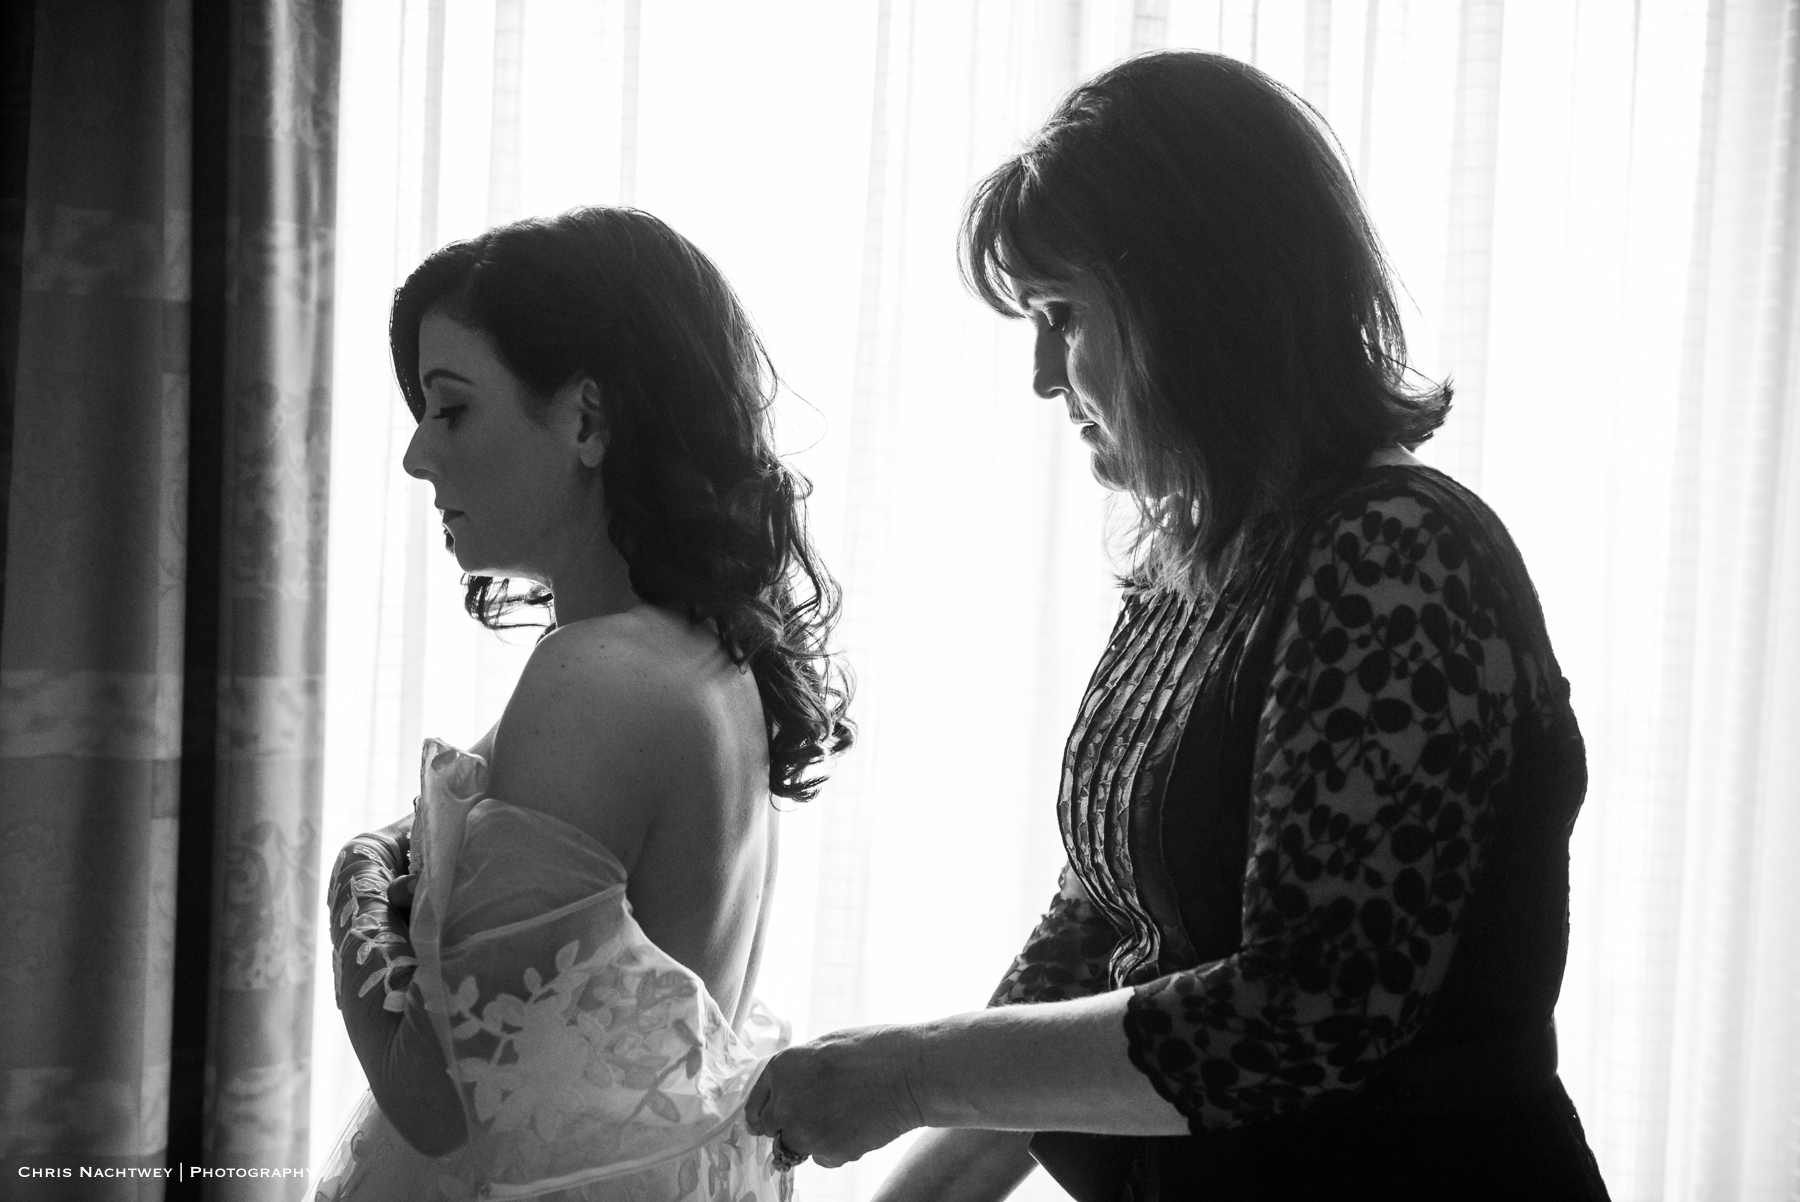 winter-branford-house-wedding-photos-groton-ct-chris-nachtwey-photography-2019-4.jpg